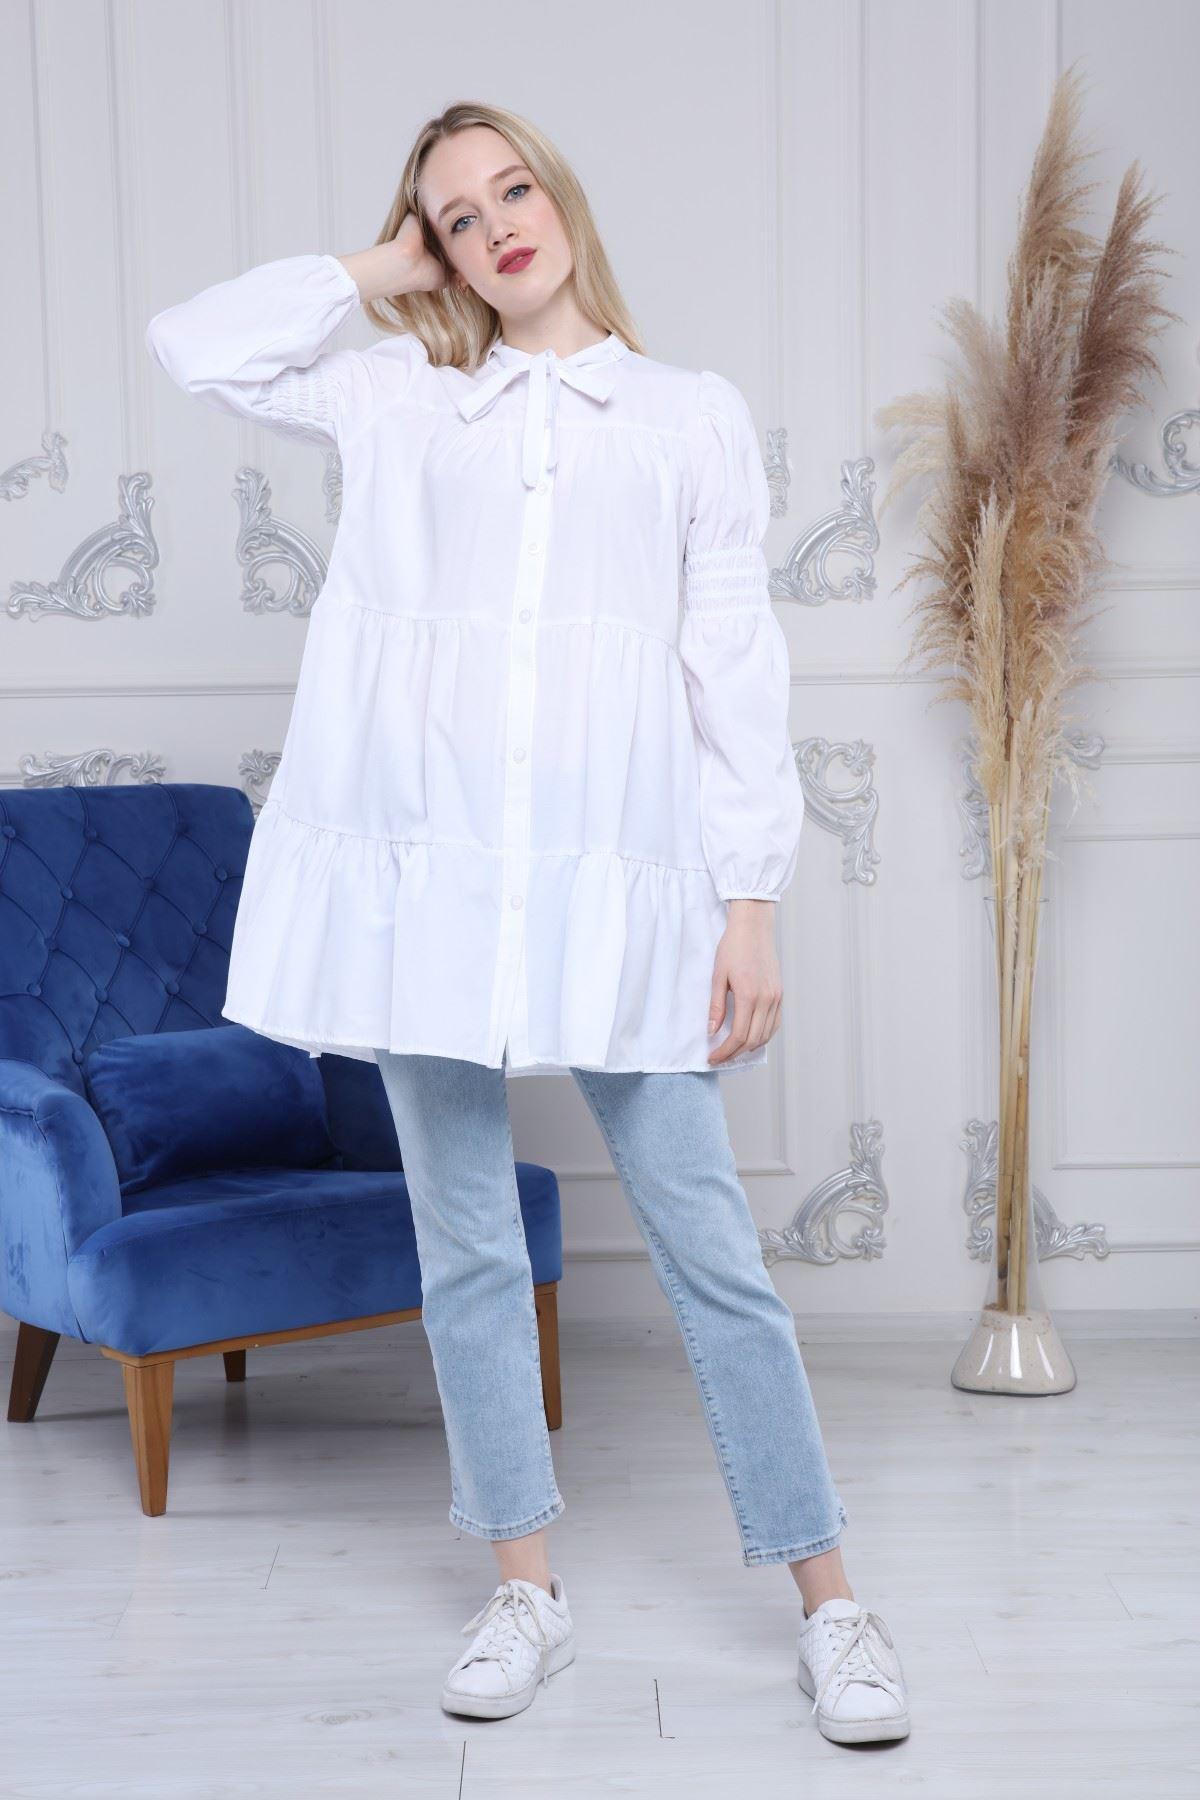 Yaka Fiyonklu Gömlek Tunik